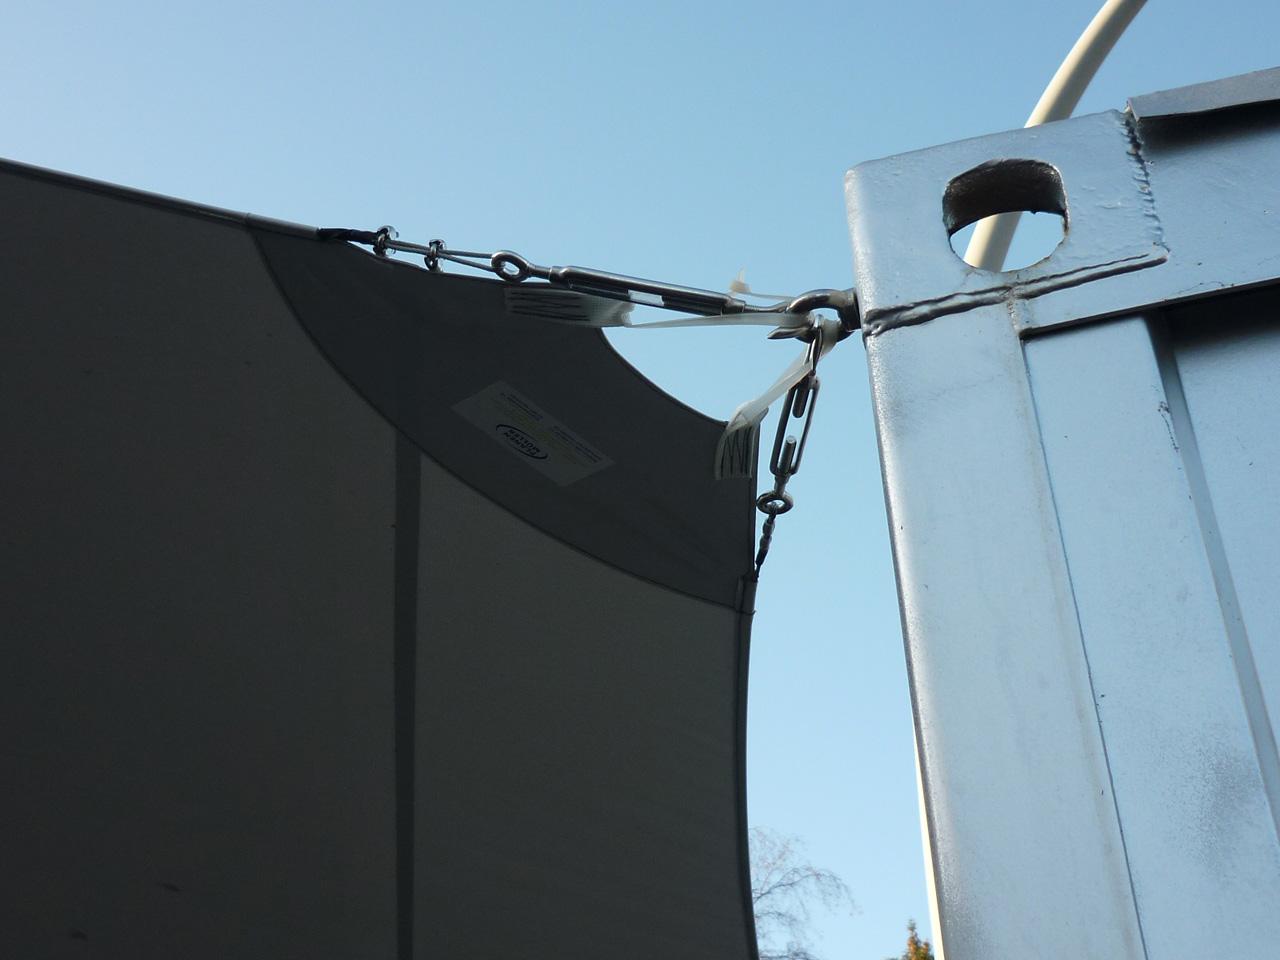 befestigung sonnensegel sonnensegel befestigung sonnensegel befestigung peddy shield psm. Black Bedroom Furniture Sets. Home Design Ideas